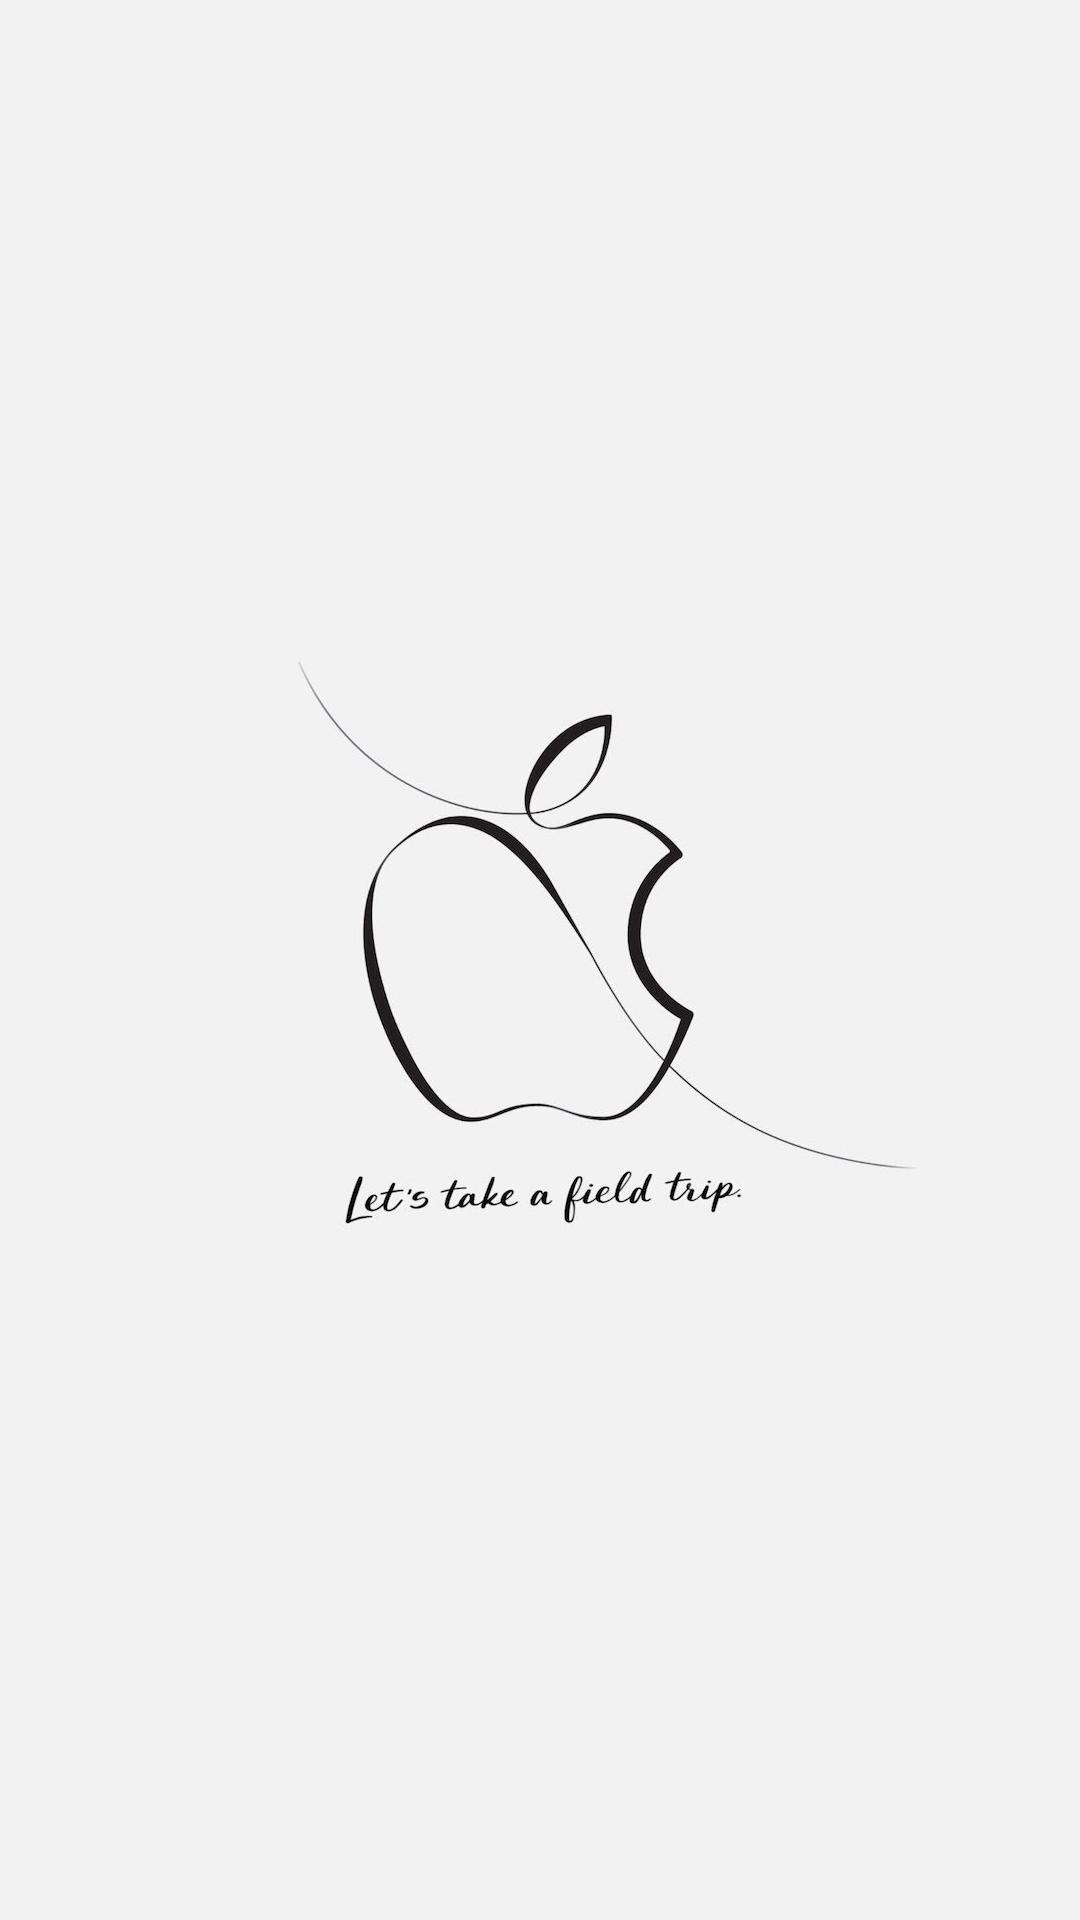 Apple Event Wallpaper Let S Take A Field Trip In 2020 Field Trip Iphone Wallpaper Smartphone Wallpaper